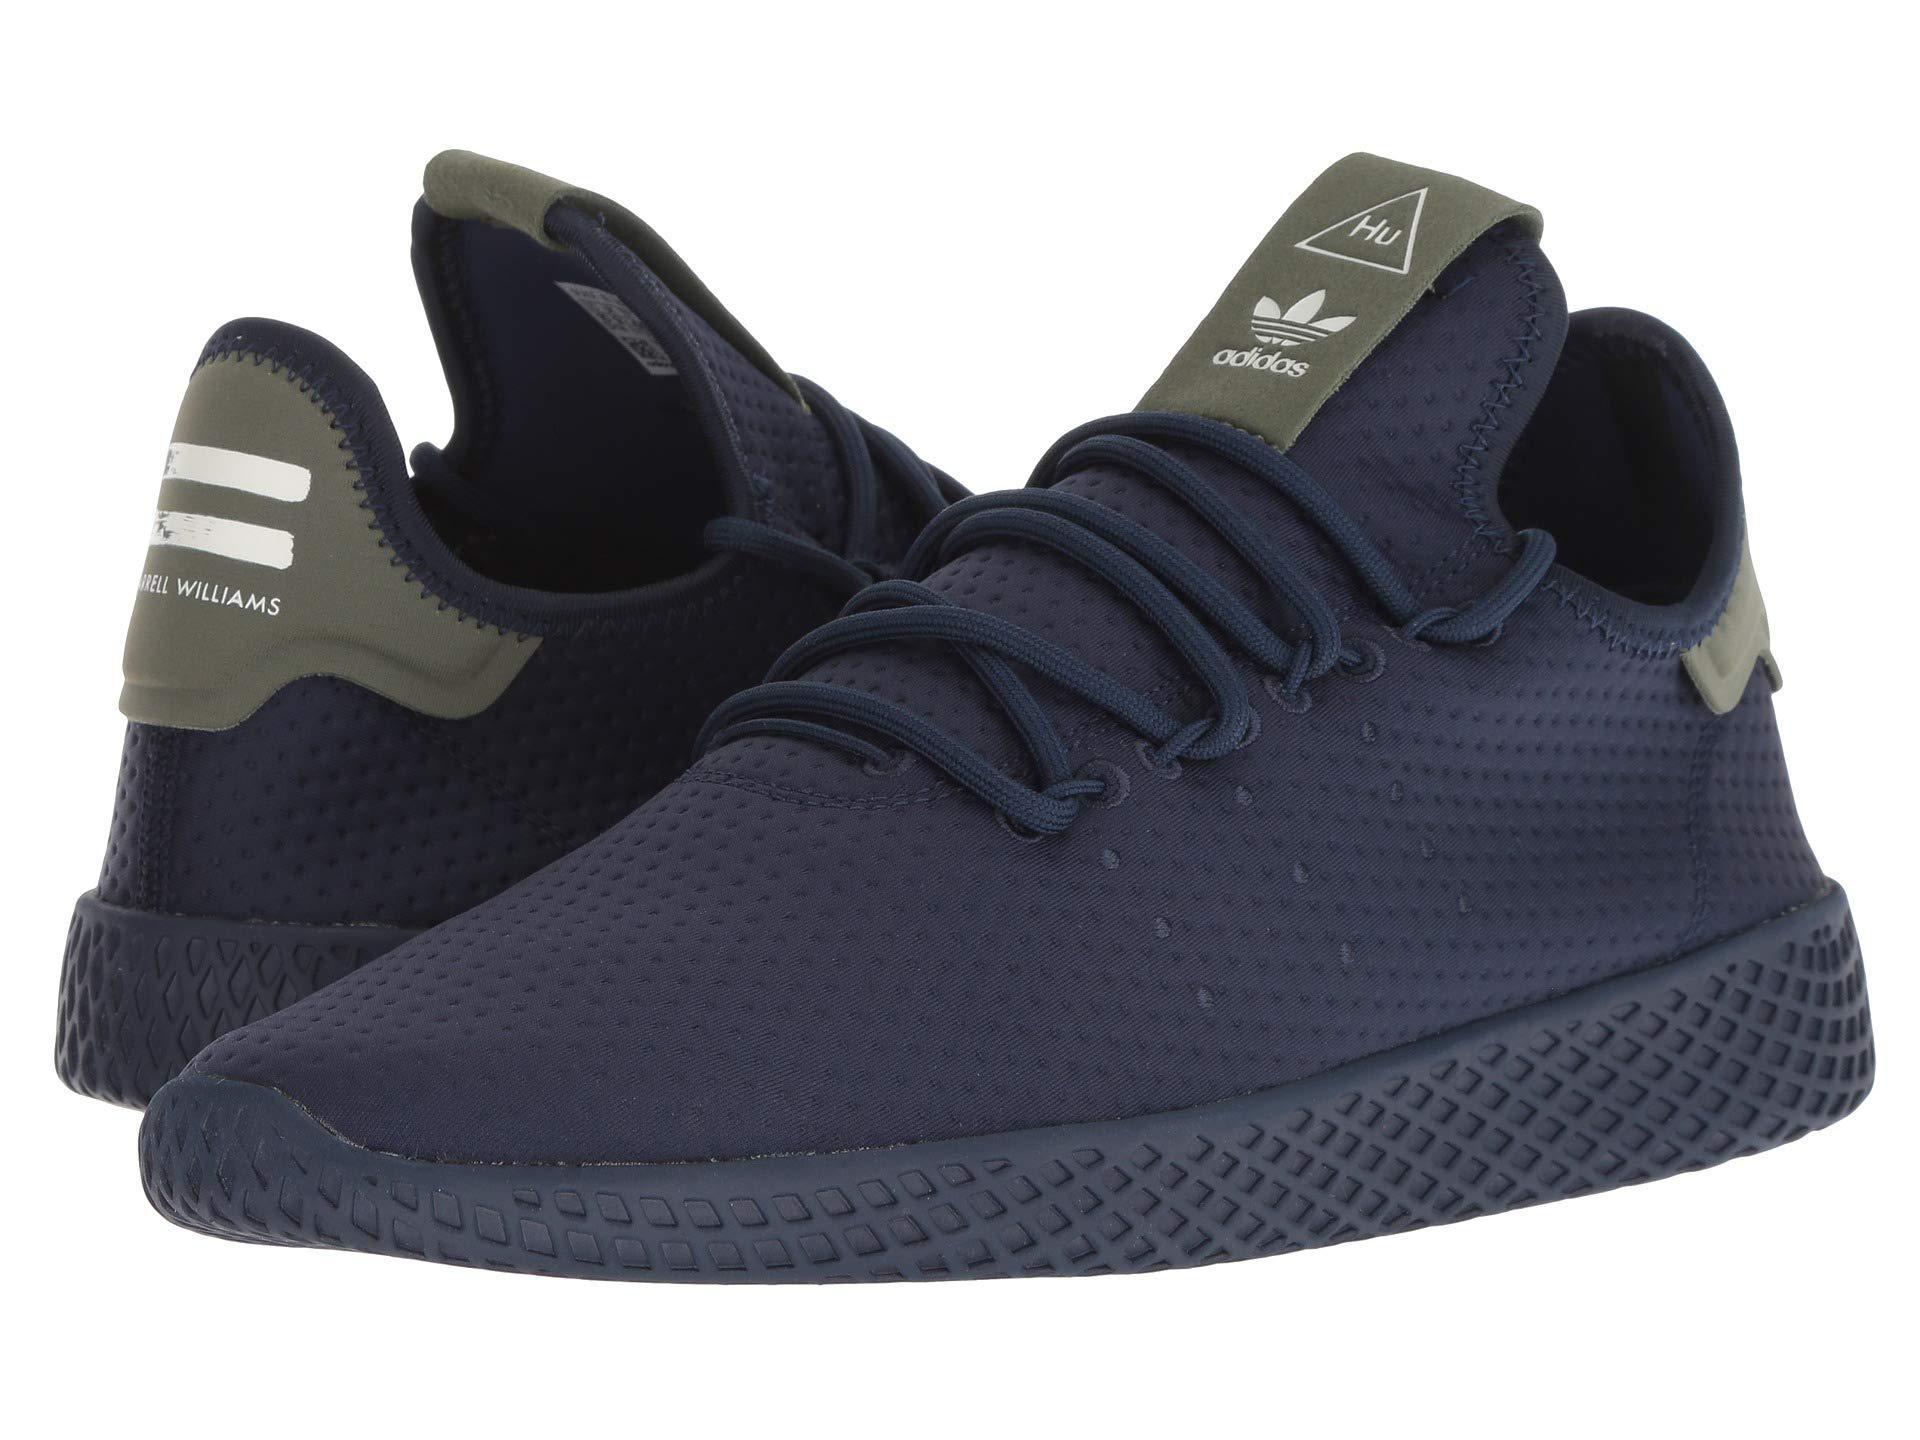 c286f8e1e85cd Lyst - adidas Originals Pharrell Williams Tennis Human Race ...